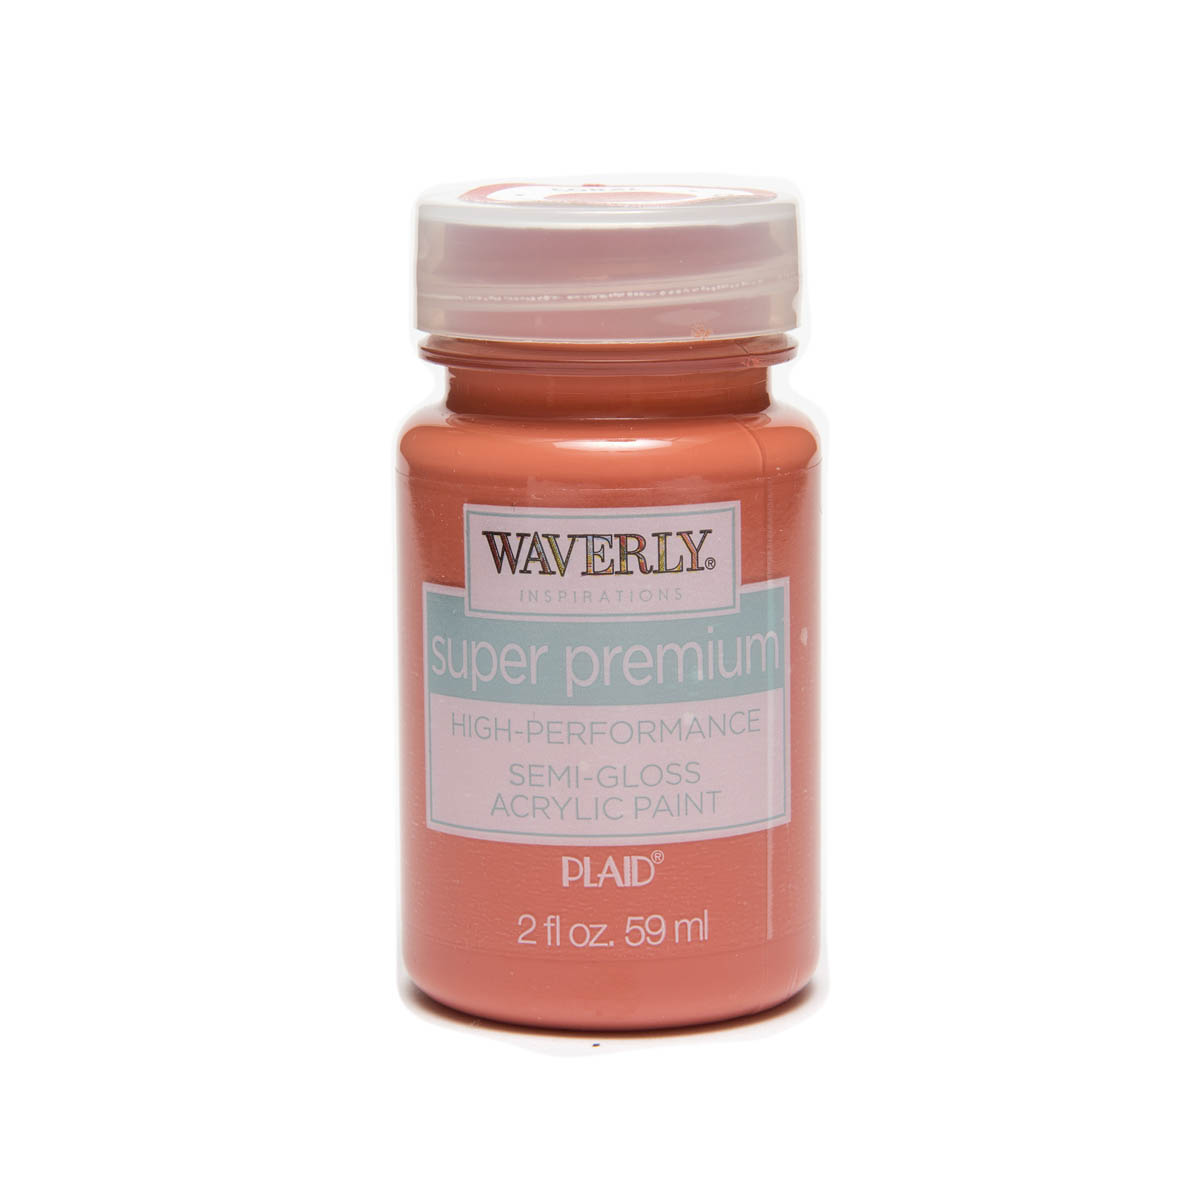 Waverly ® Inspirations Super Premium Semi-Gloss Acrylic Paint - Coral, 2 oz.